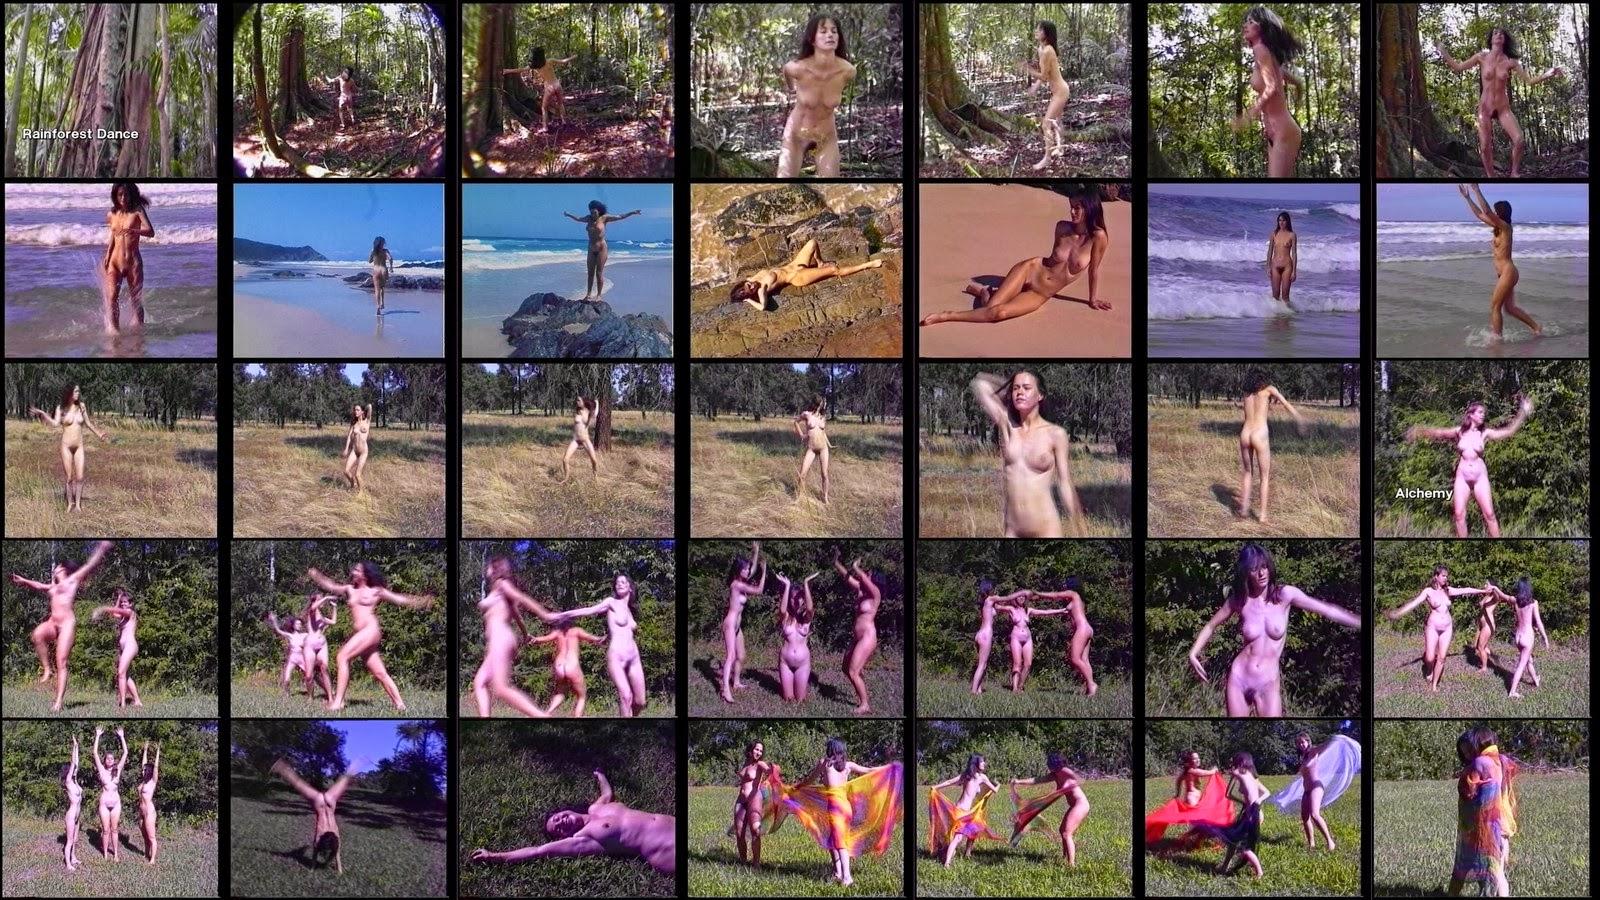 hd-video-tantsuet-golaya